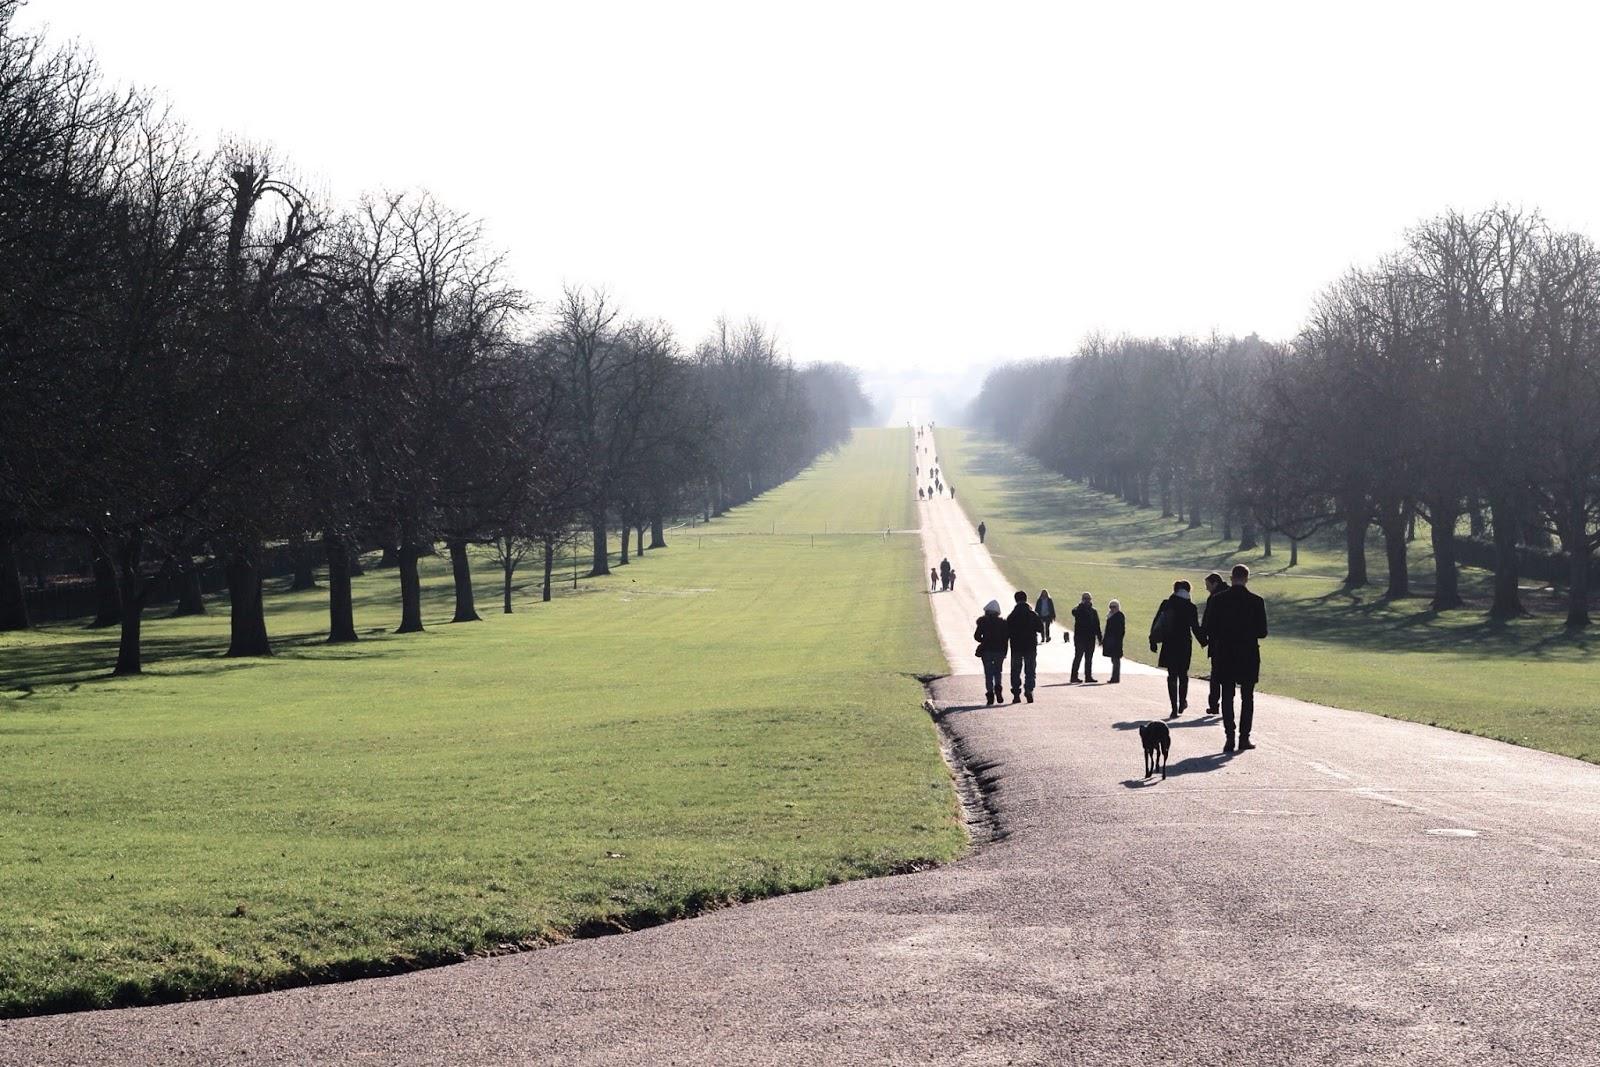 Windsor The Long Walk at winter